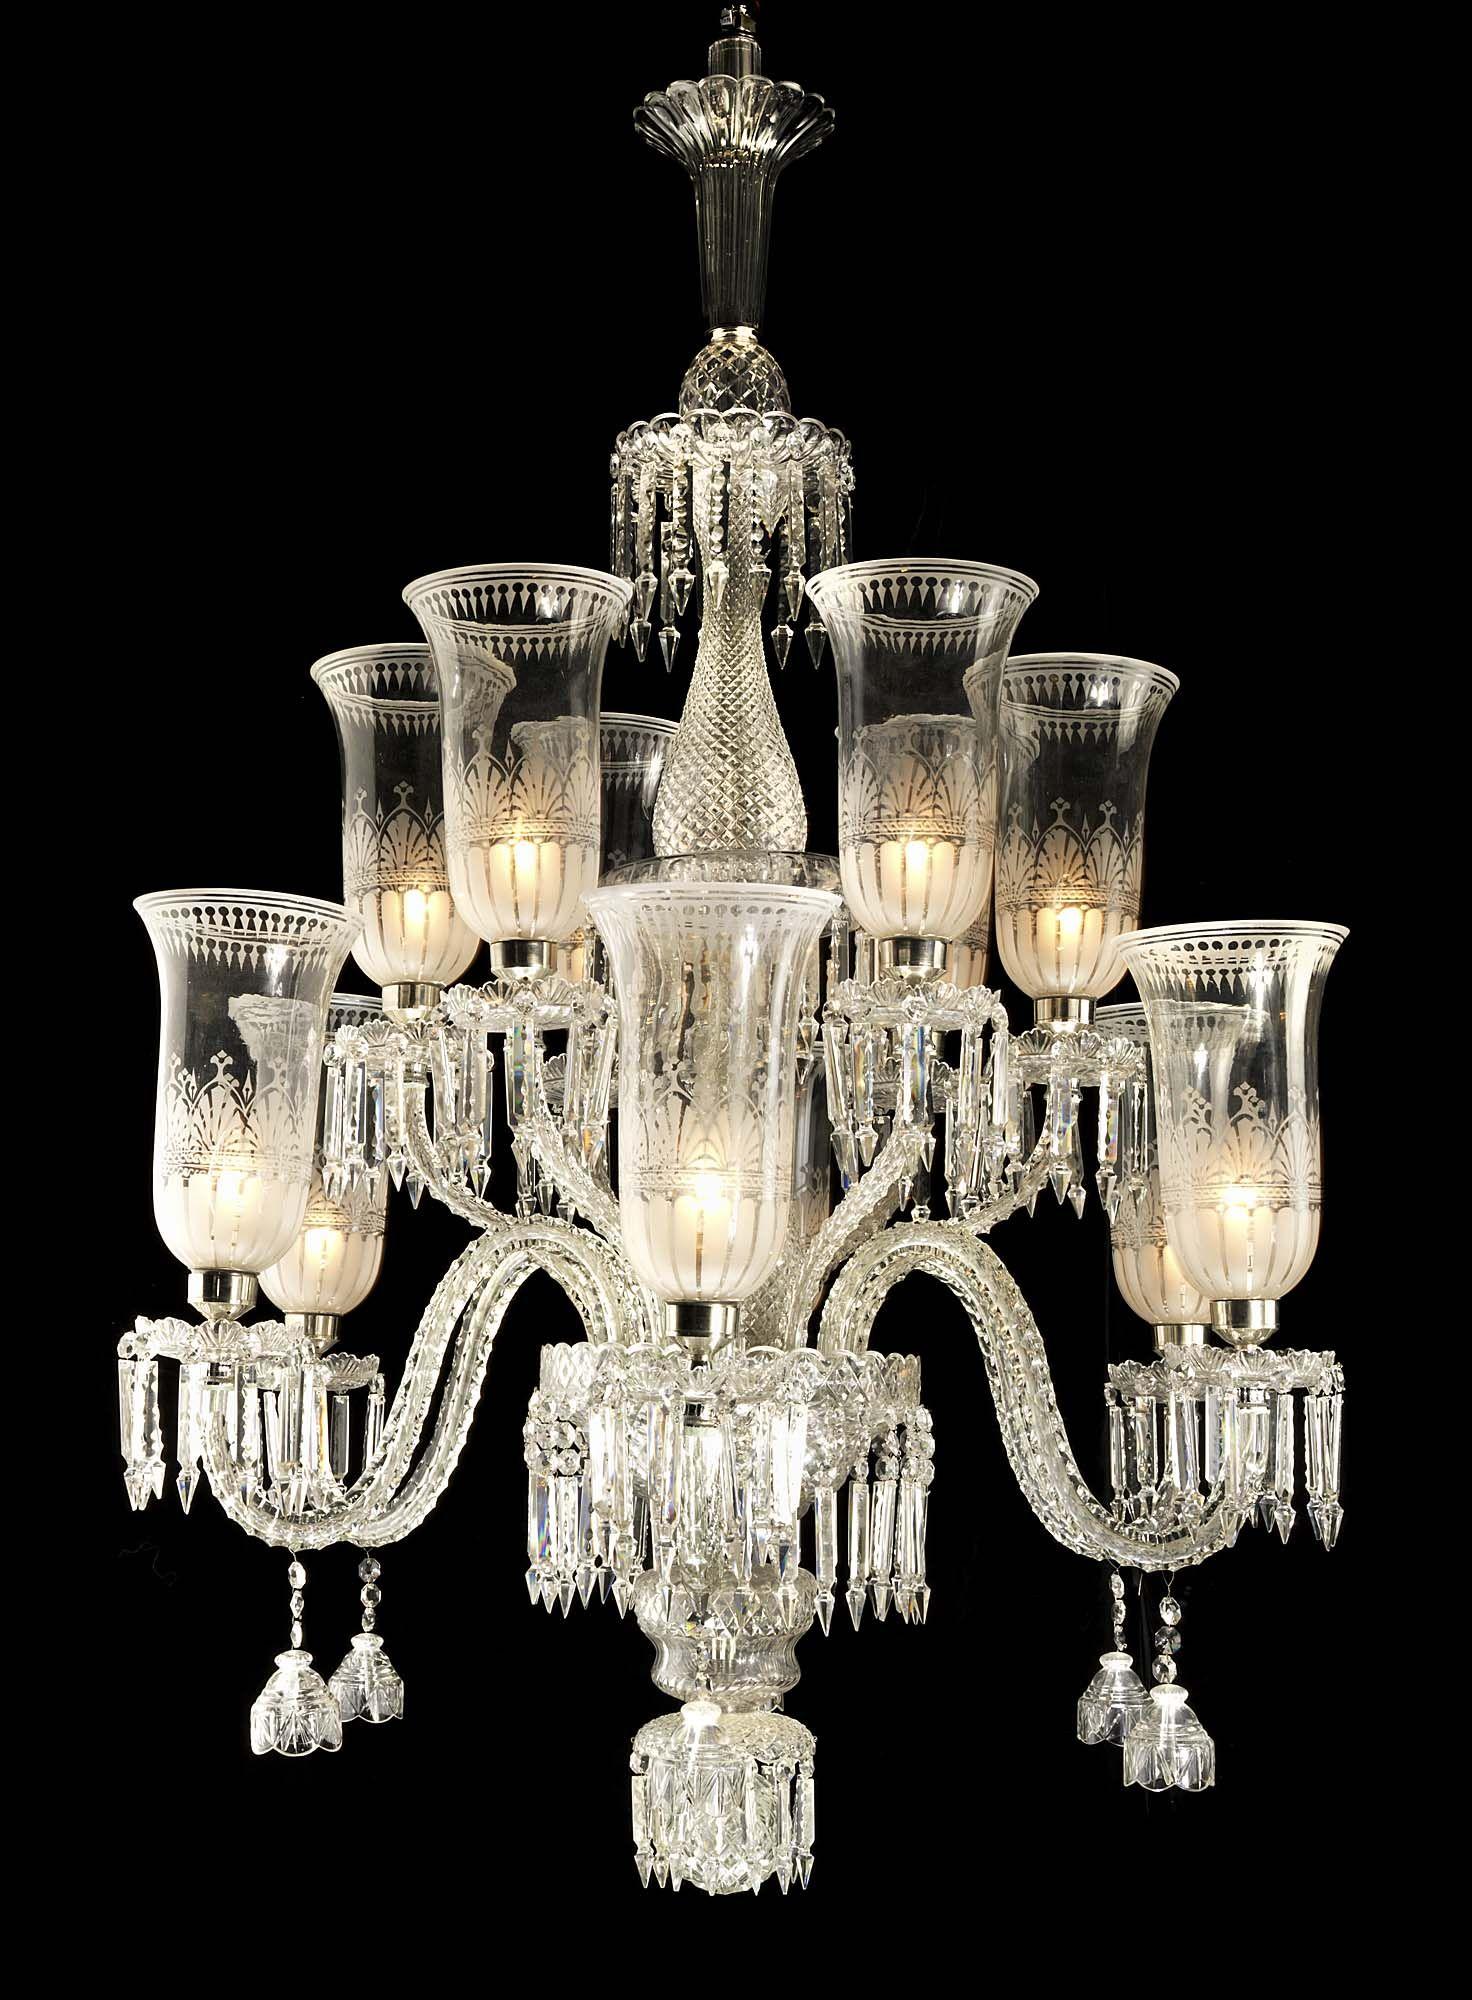 Antique Osler Crystal Chandelier Crystal Chandelier Mirror